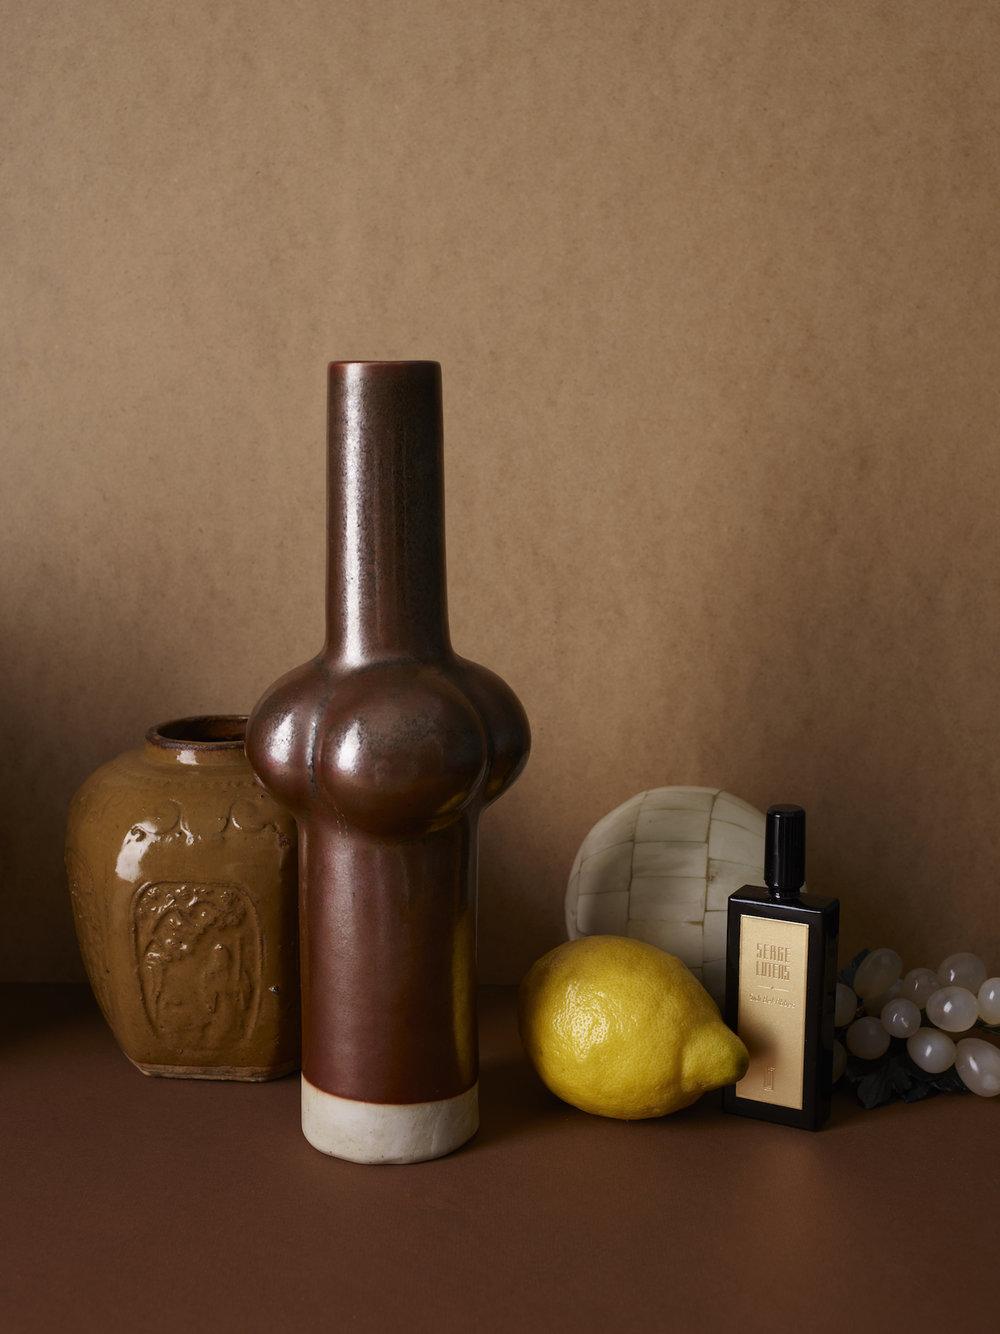 Parfyme: SERGE LAUTENS / Heaven ScentVintage Keramik: Rydeng Oslo